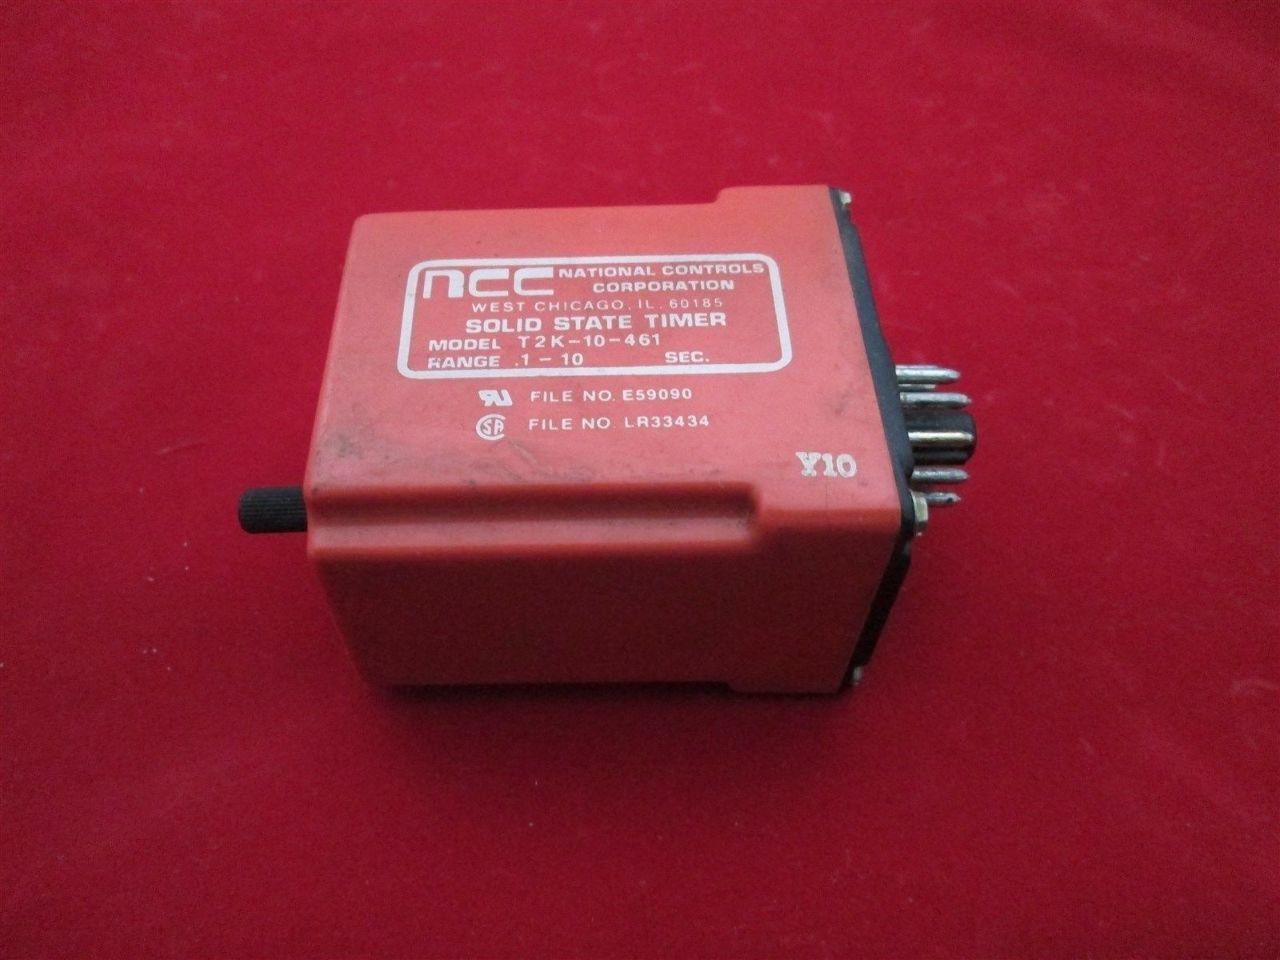 Clock Alarm Controlled Light Switch T K Hareendran Light Switches